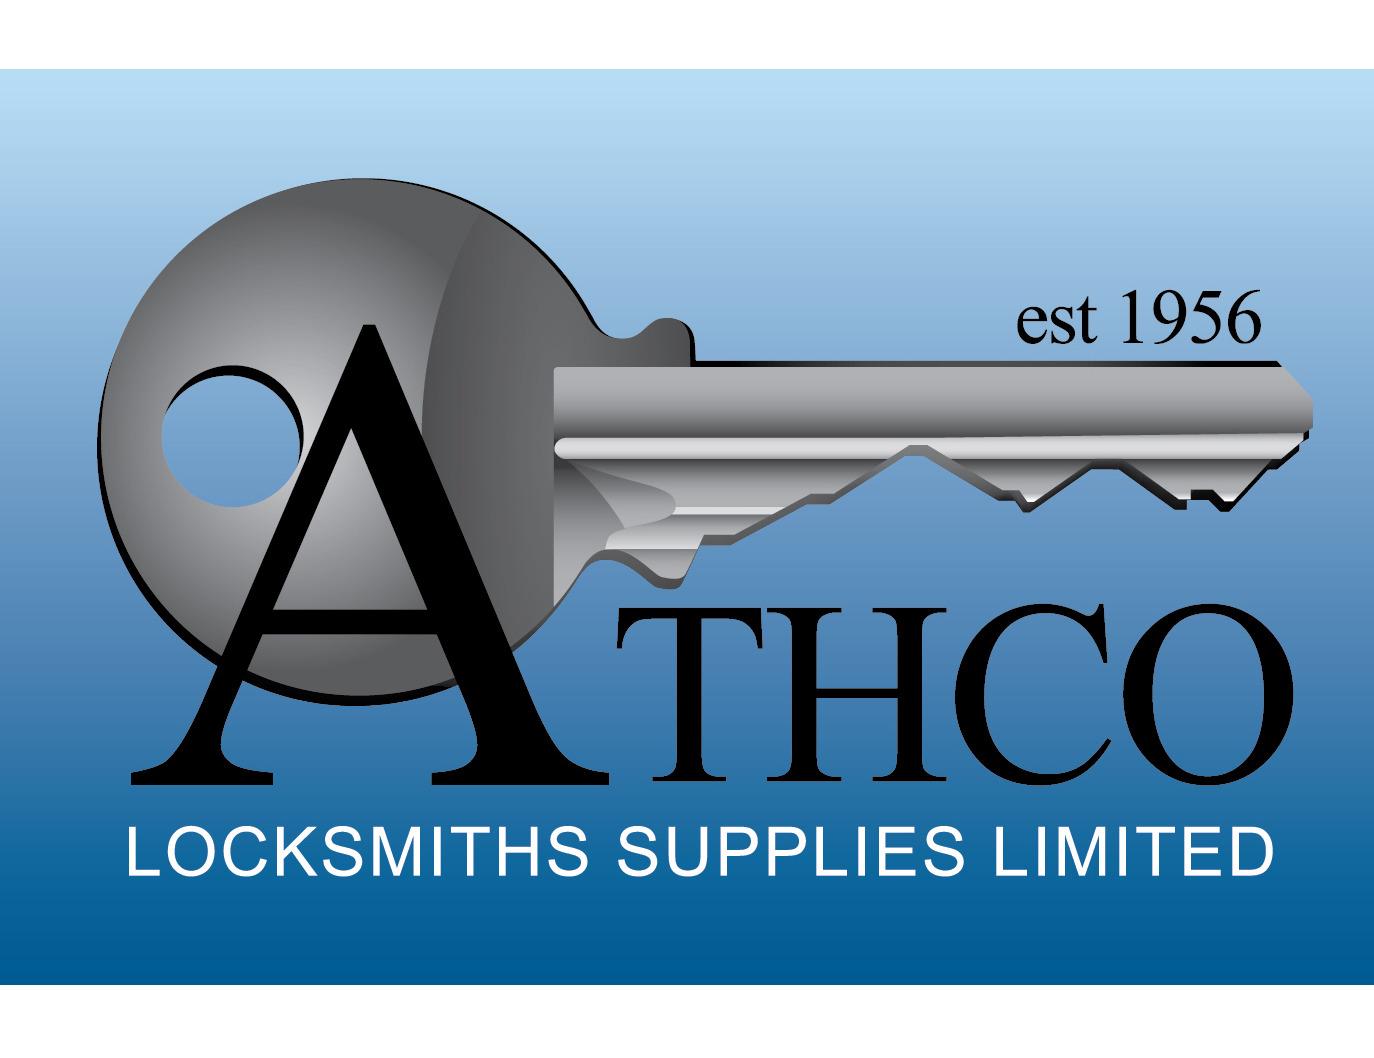 Athco Locksmiths Supplies Ltd